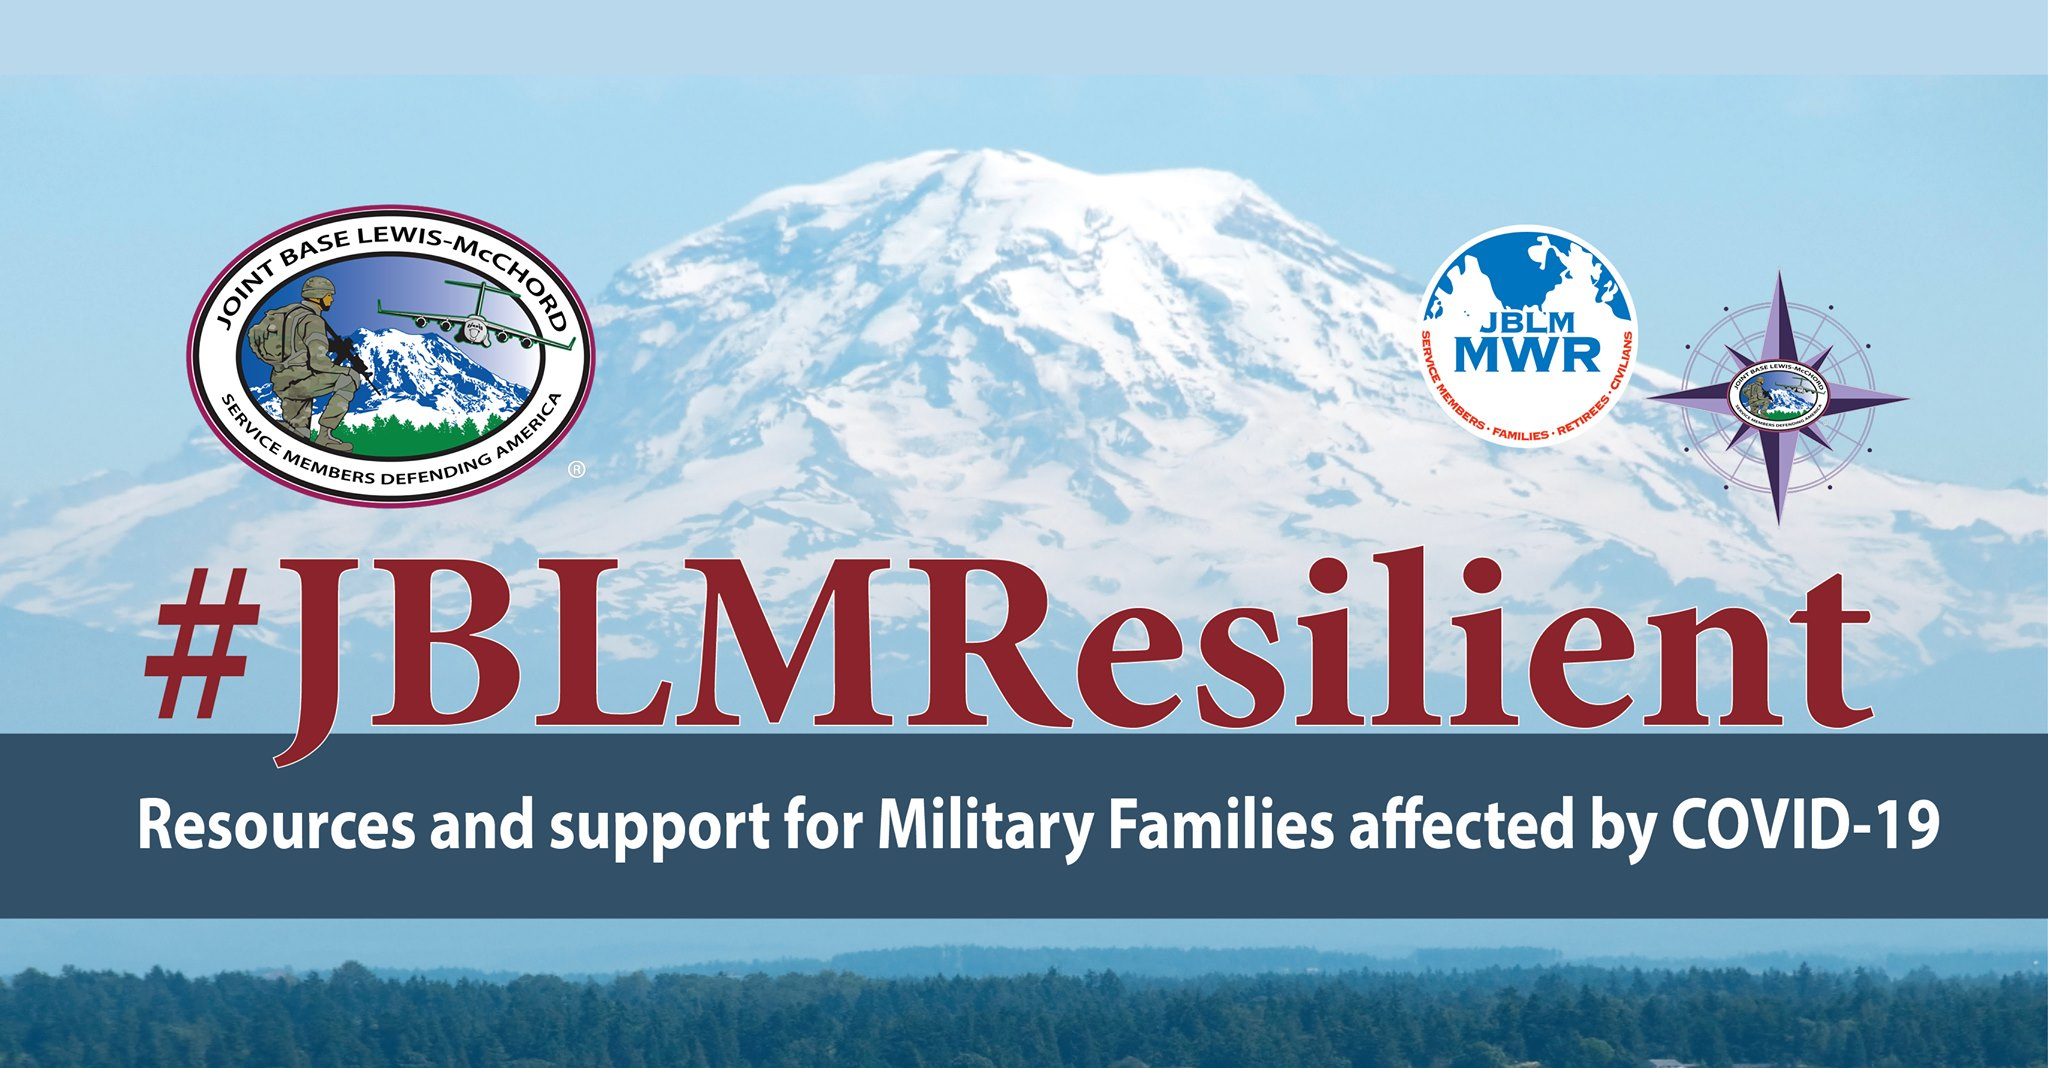 JBLM Resilient